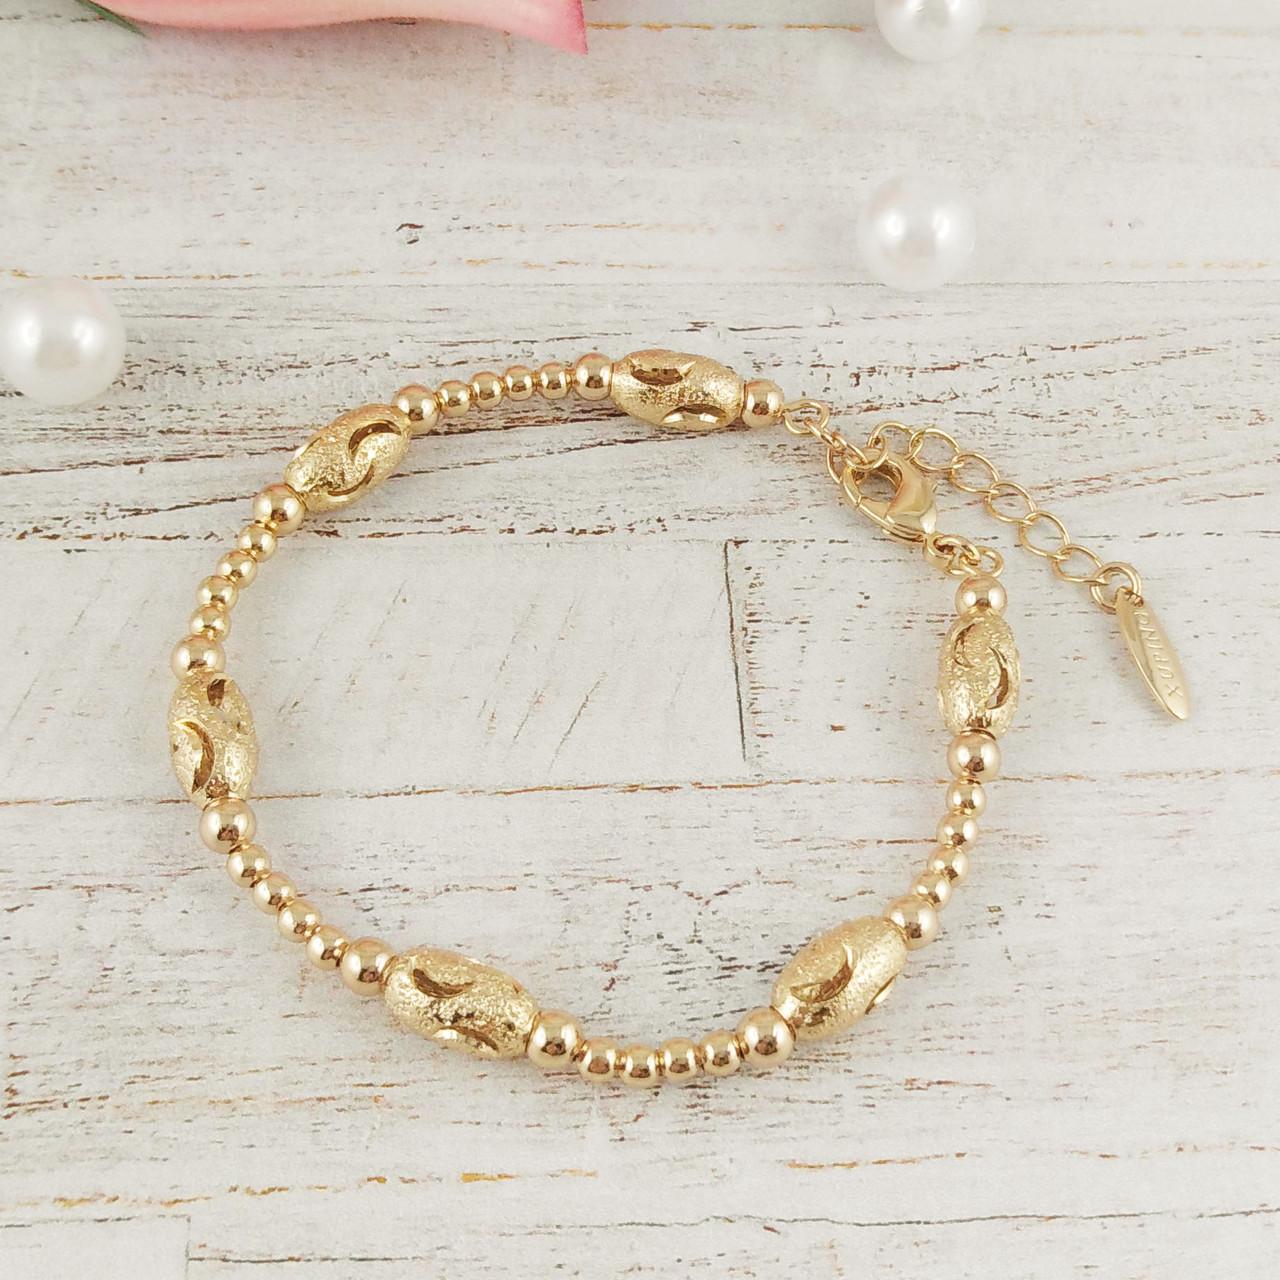 "Браслет Xuping Jewelry 17/21 см ""Плетение Перлина"" с бусинами, медицинское золото, позолота 18К. А/В 3329"